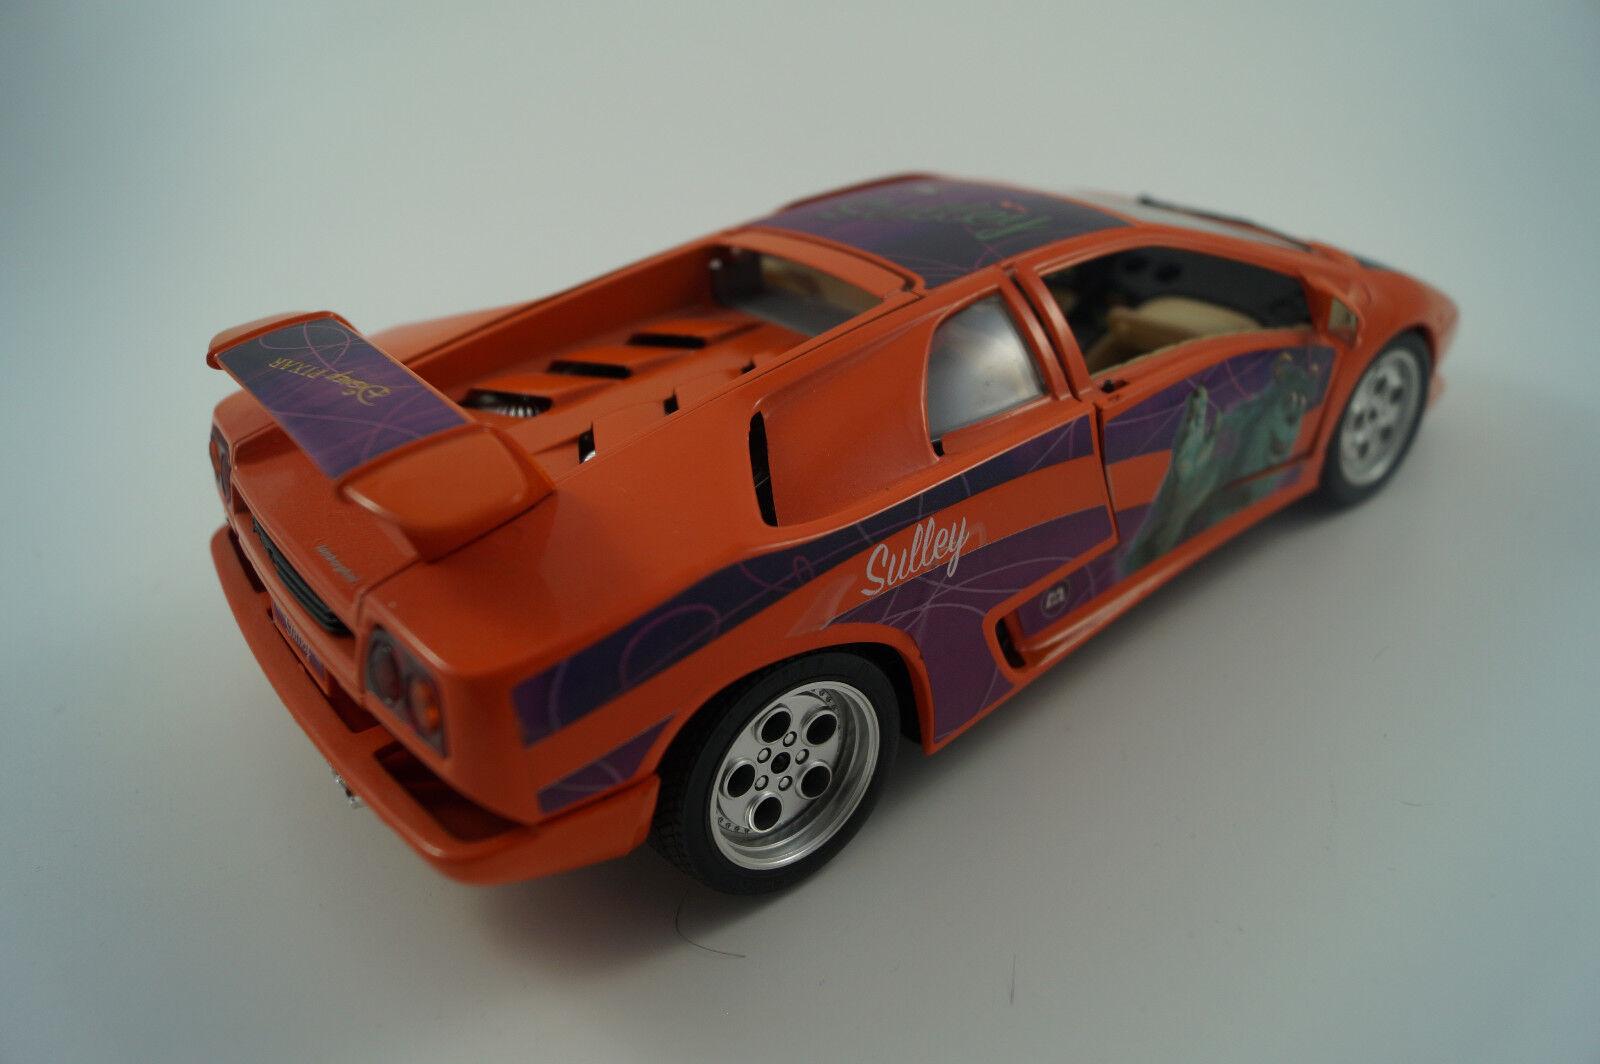 BBURAGO BURAGO voiture miniature 1 18 LAMBORGHINI LAMBORGHINI LAMBORGHINI DIABLO 1990 Sully 595954